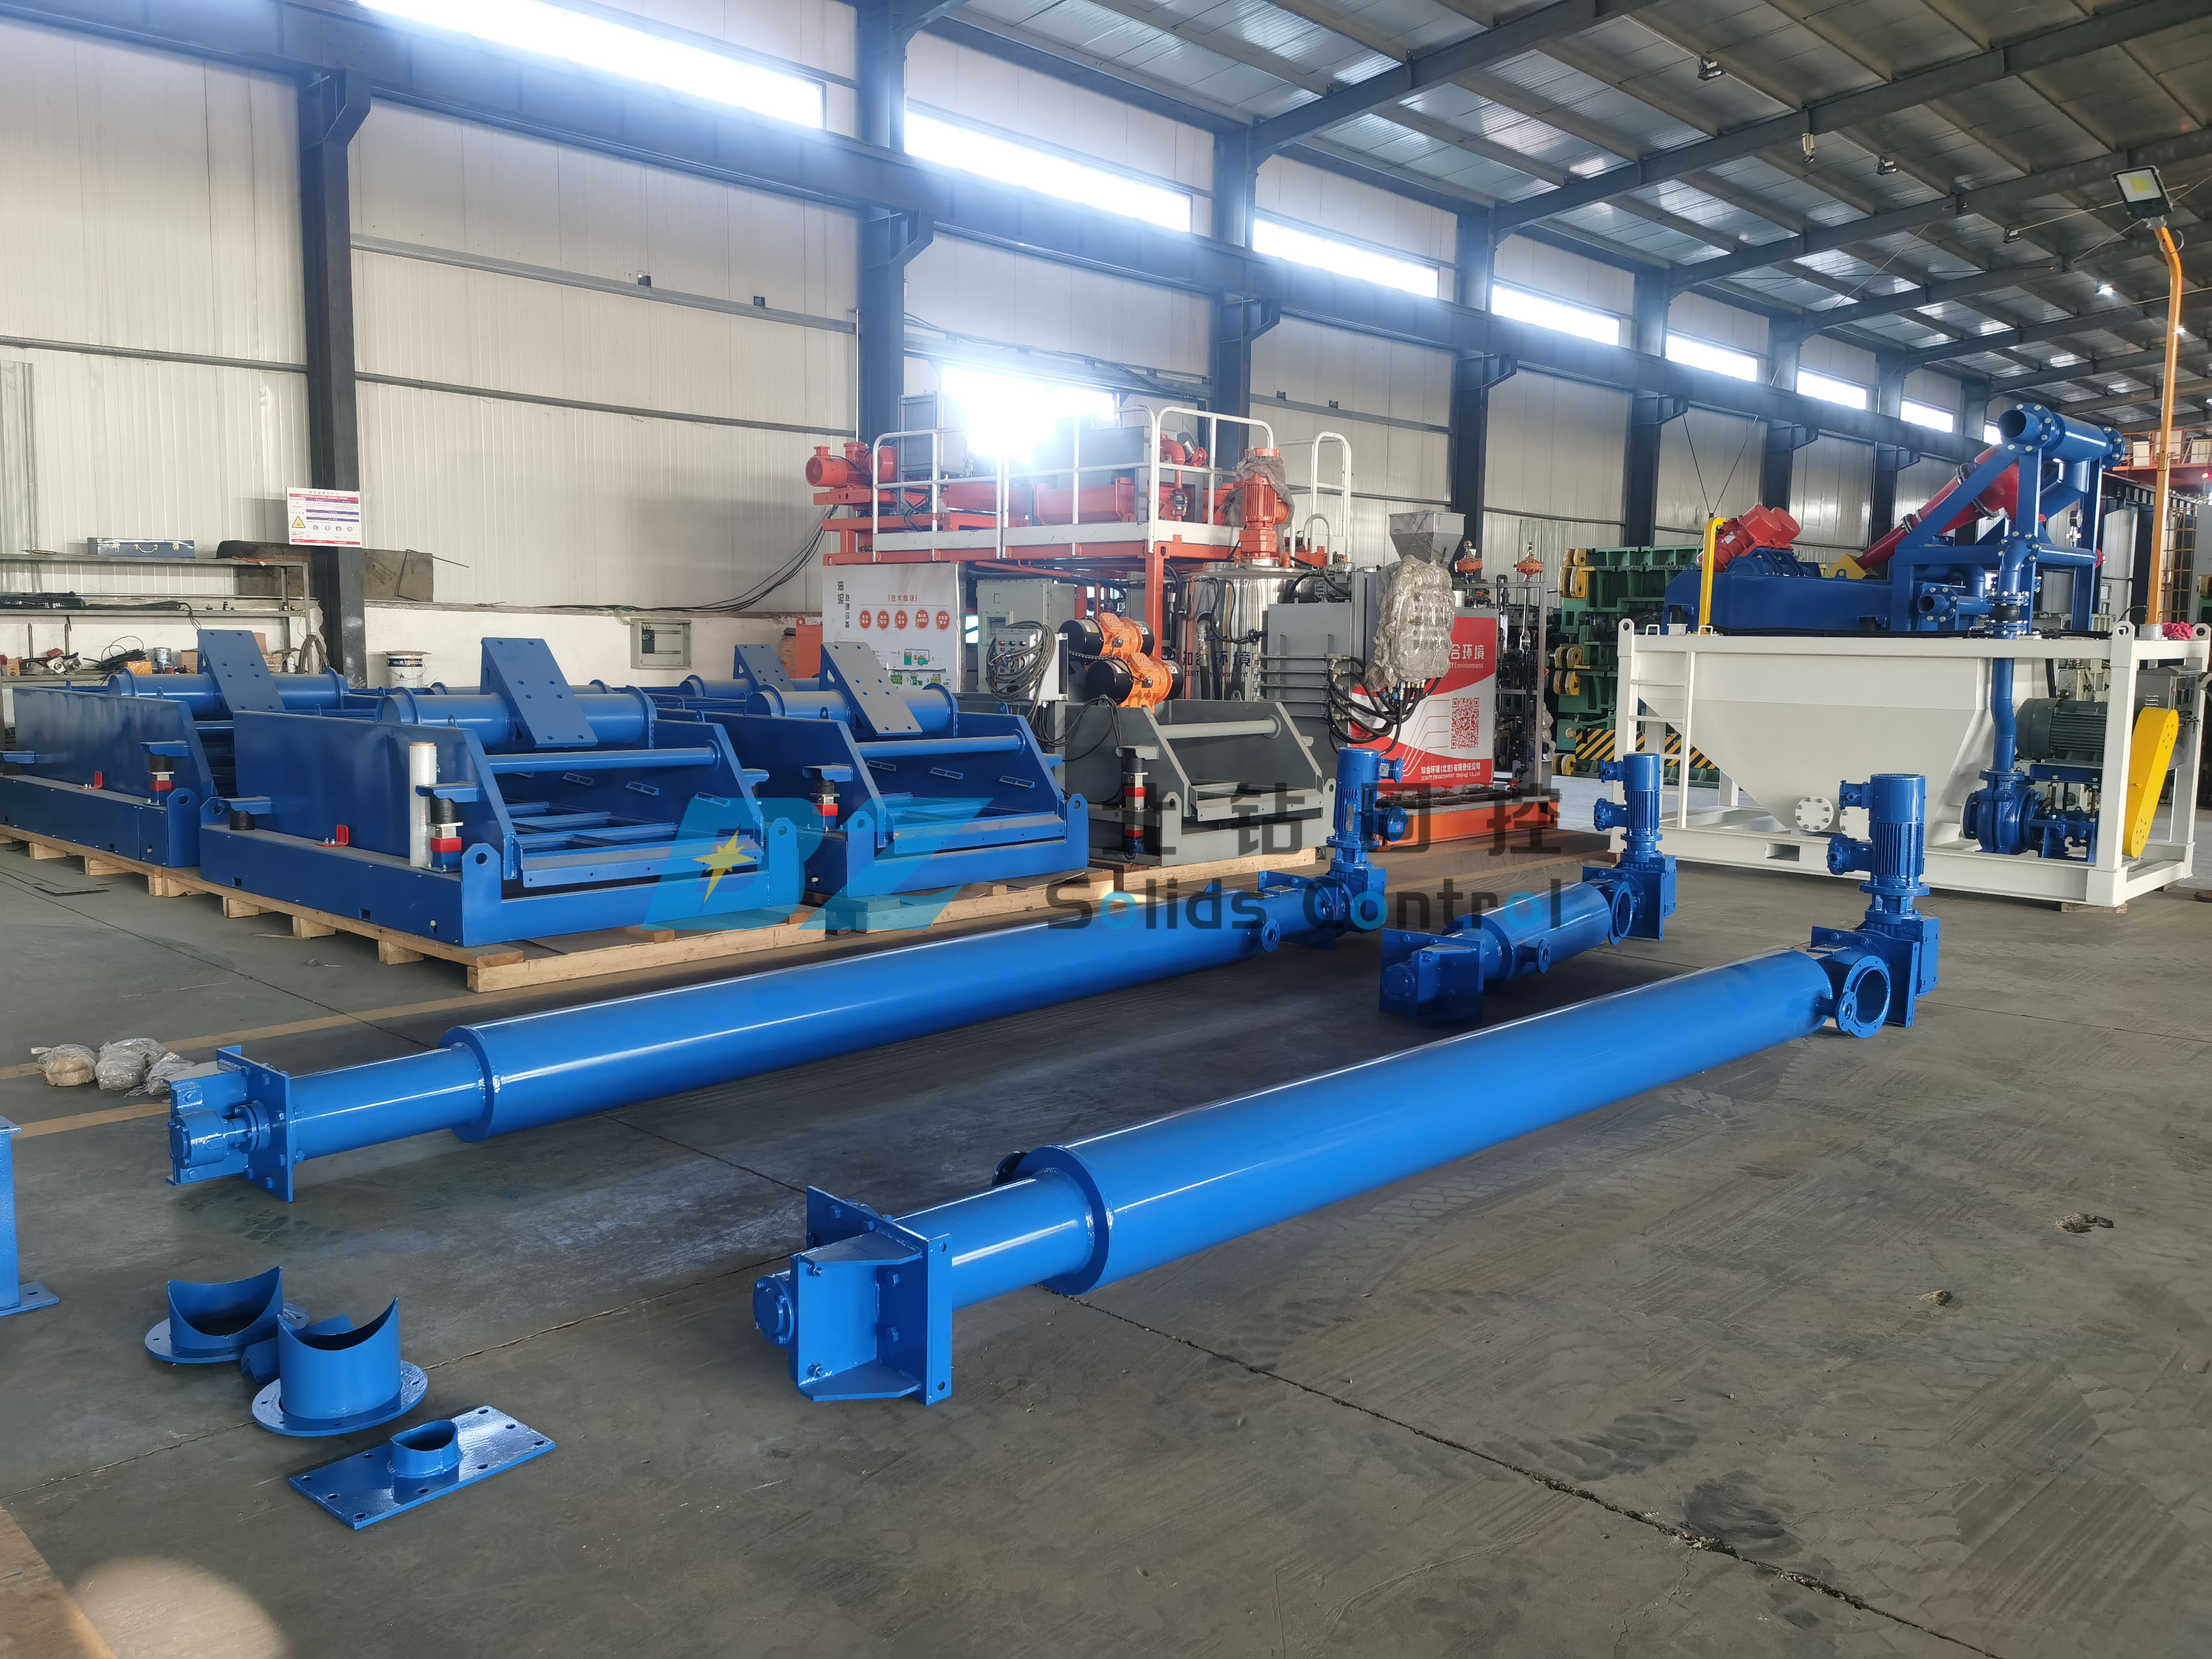 BZ screw conveyor were sent to oil sludge treatment site